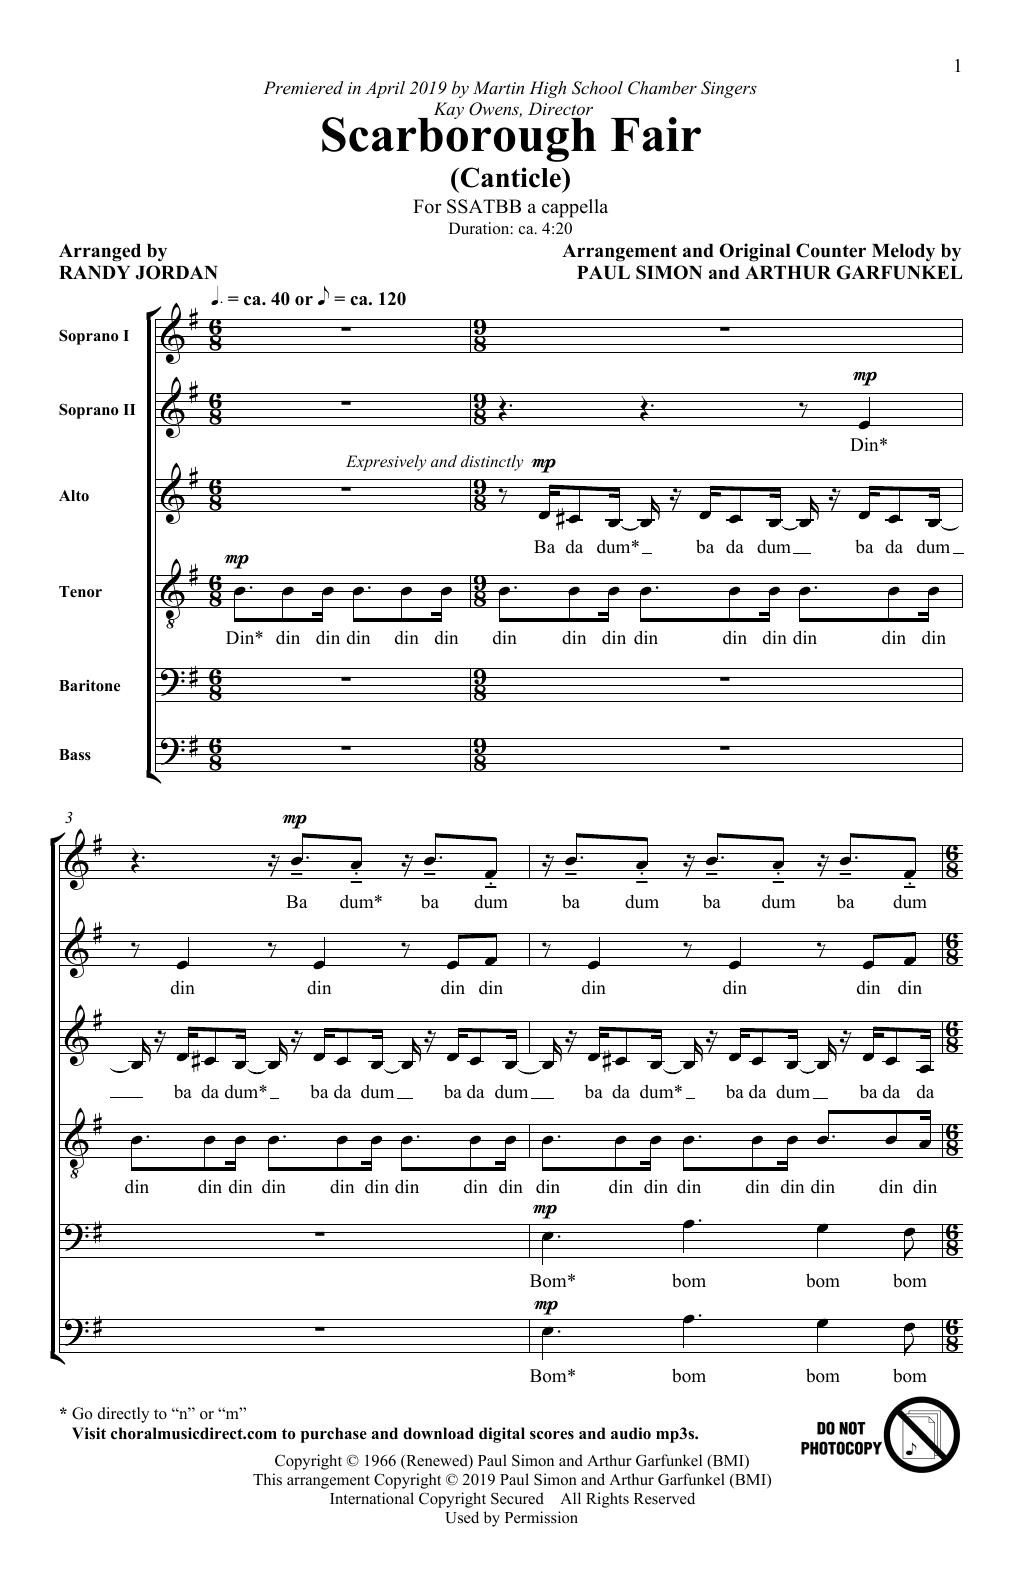 Scarborough Fair/Canticle (arr. Randy Jordan) Sheet Music